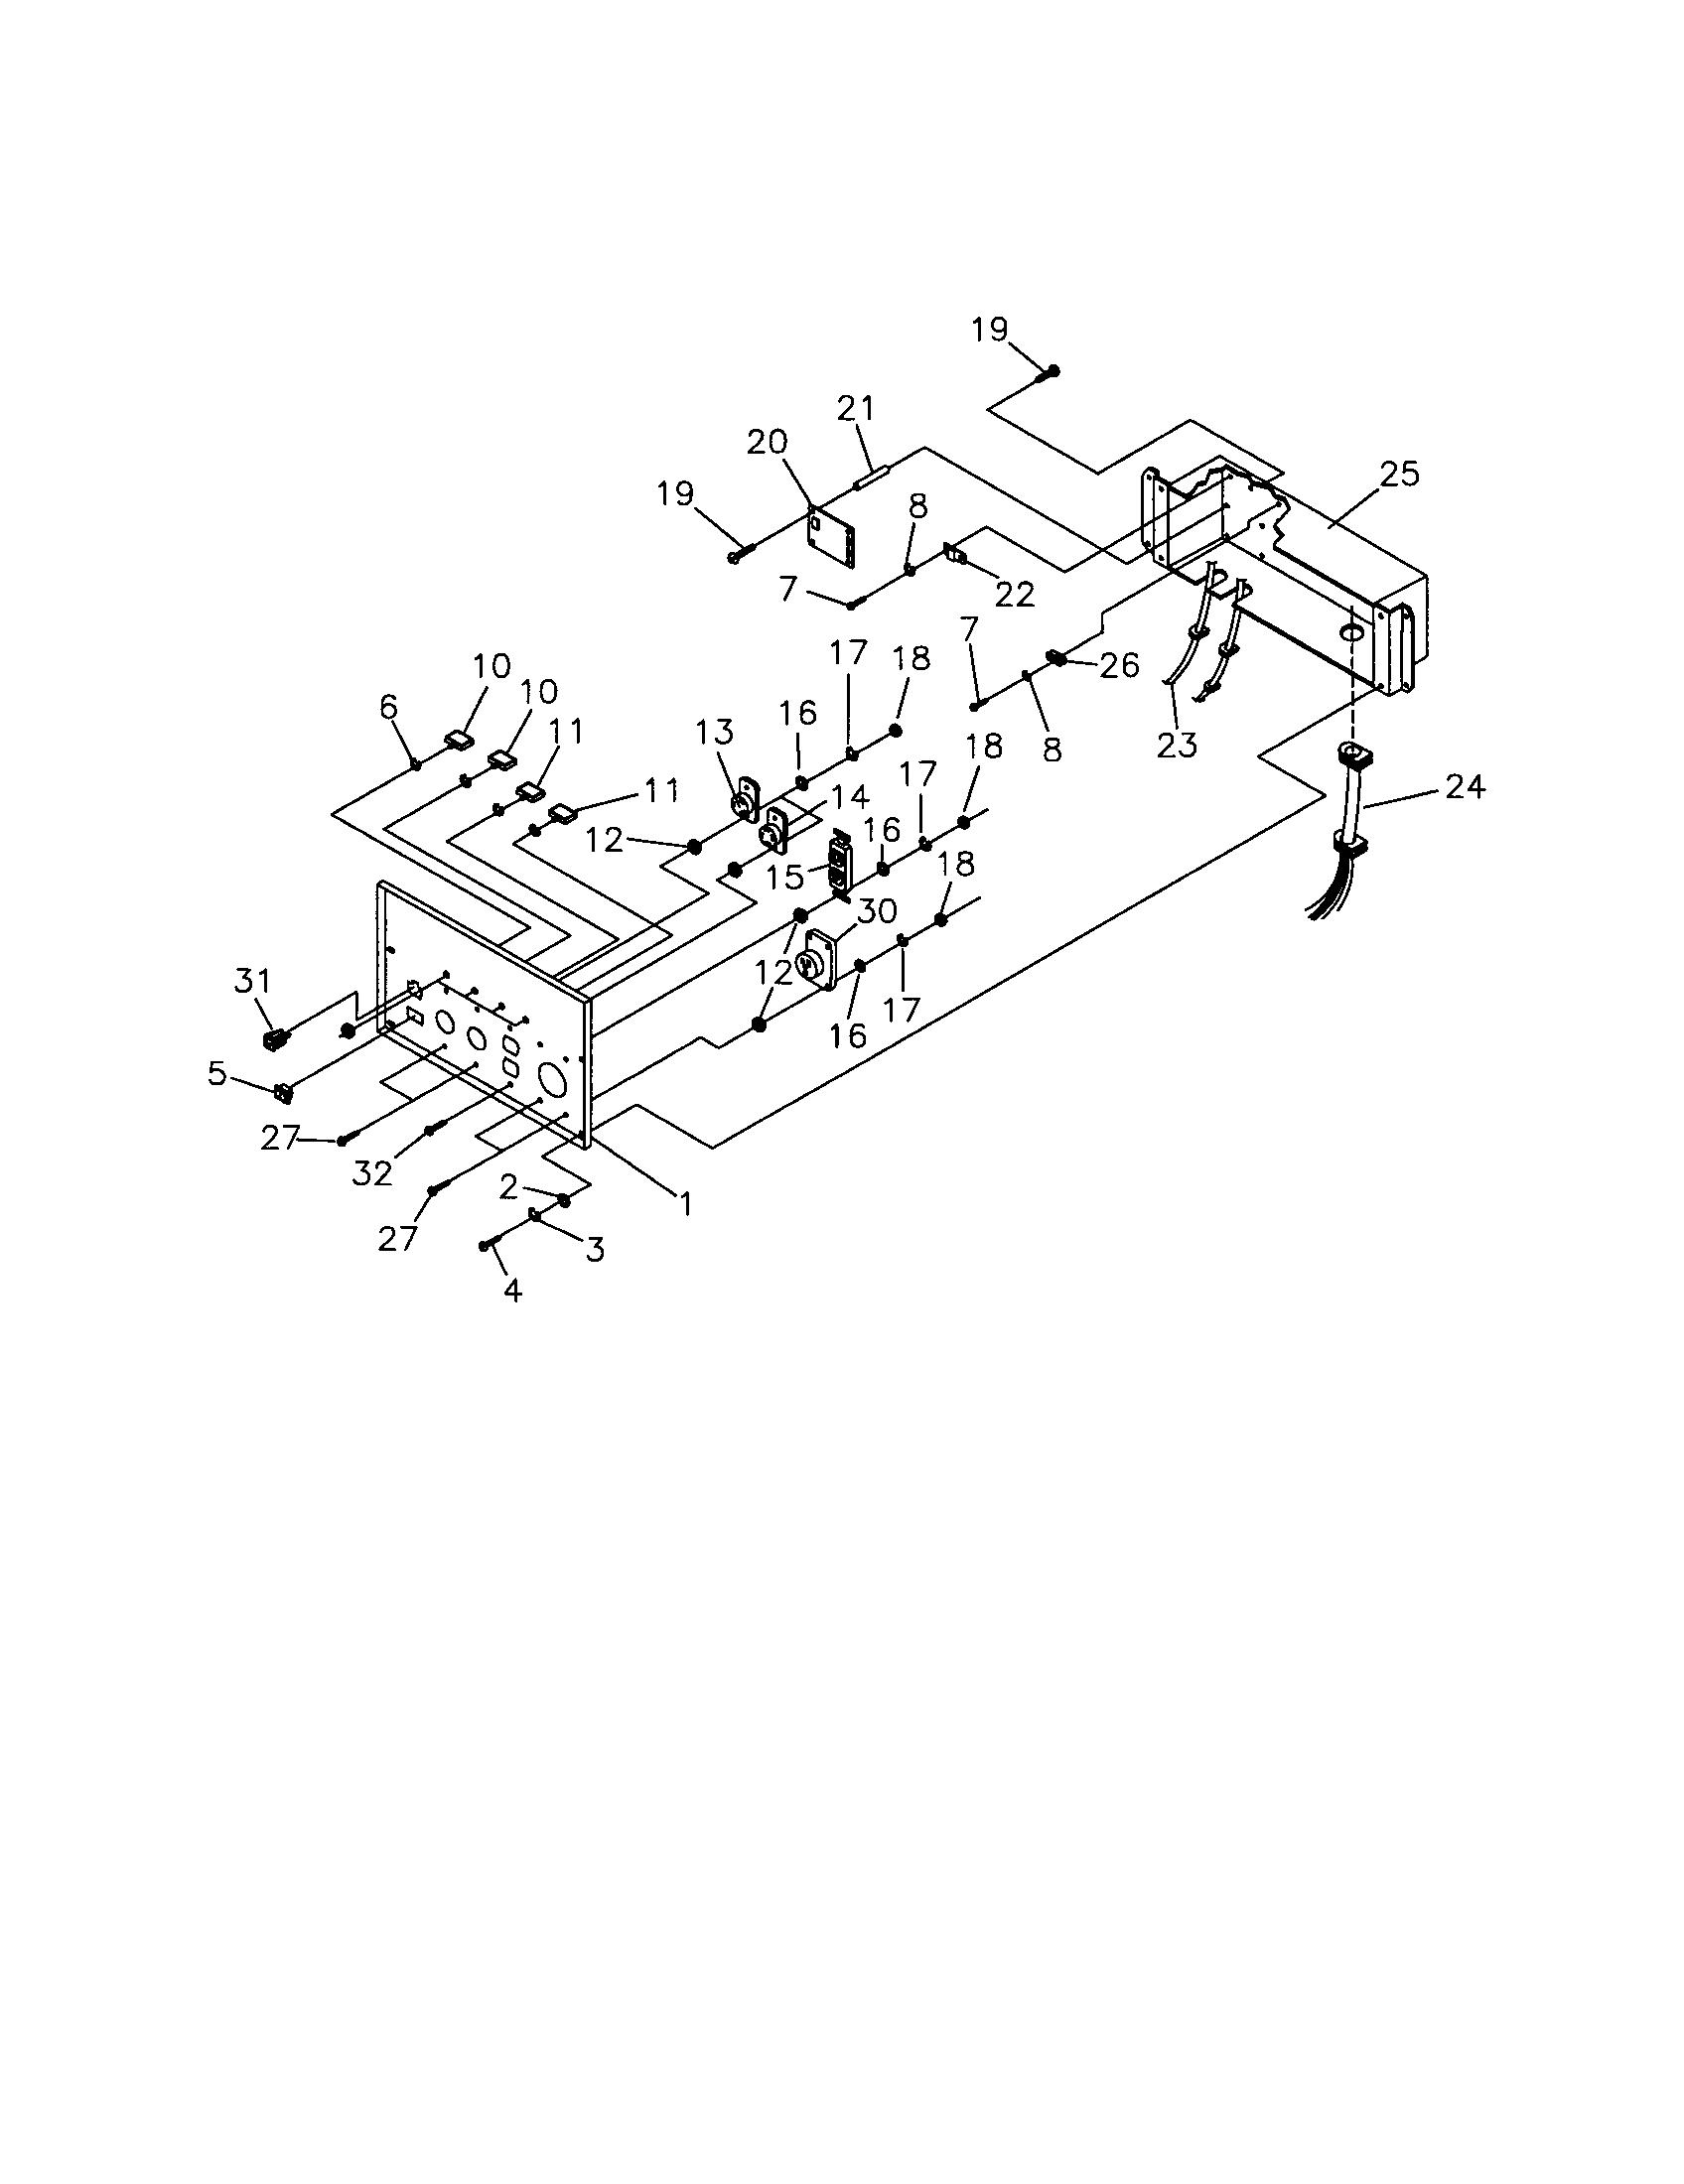 Craftsman craftsman 7500 watt ac generator parts model 580327181 sears partsdirect